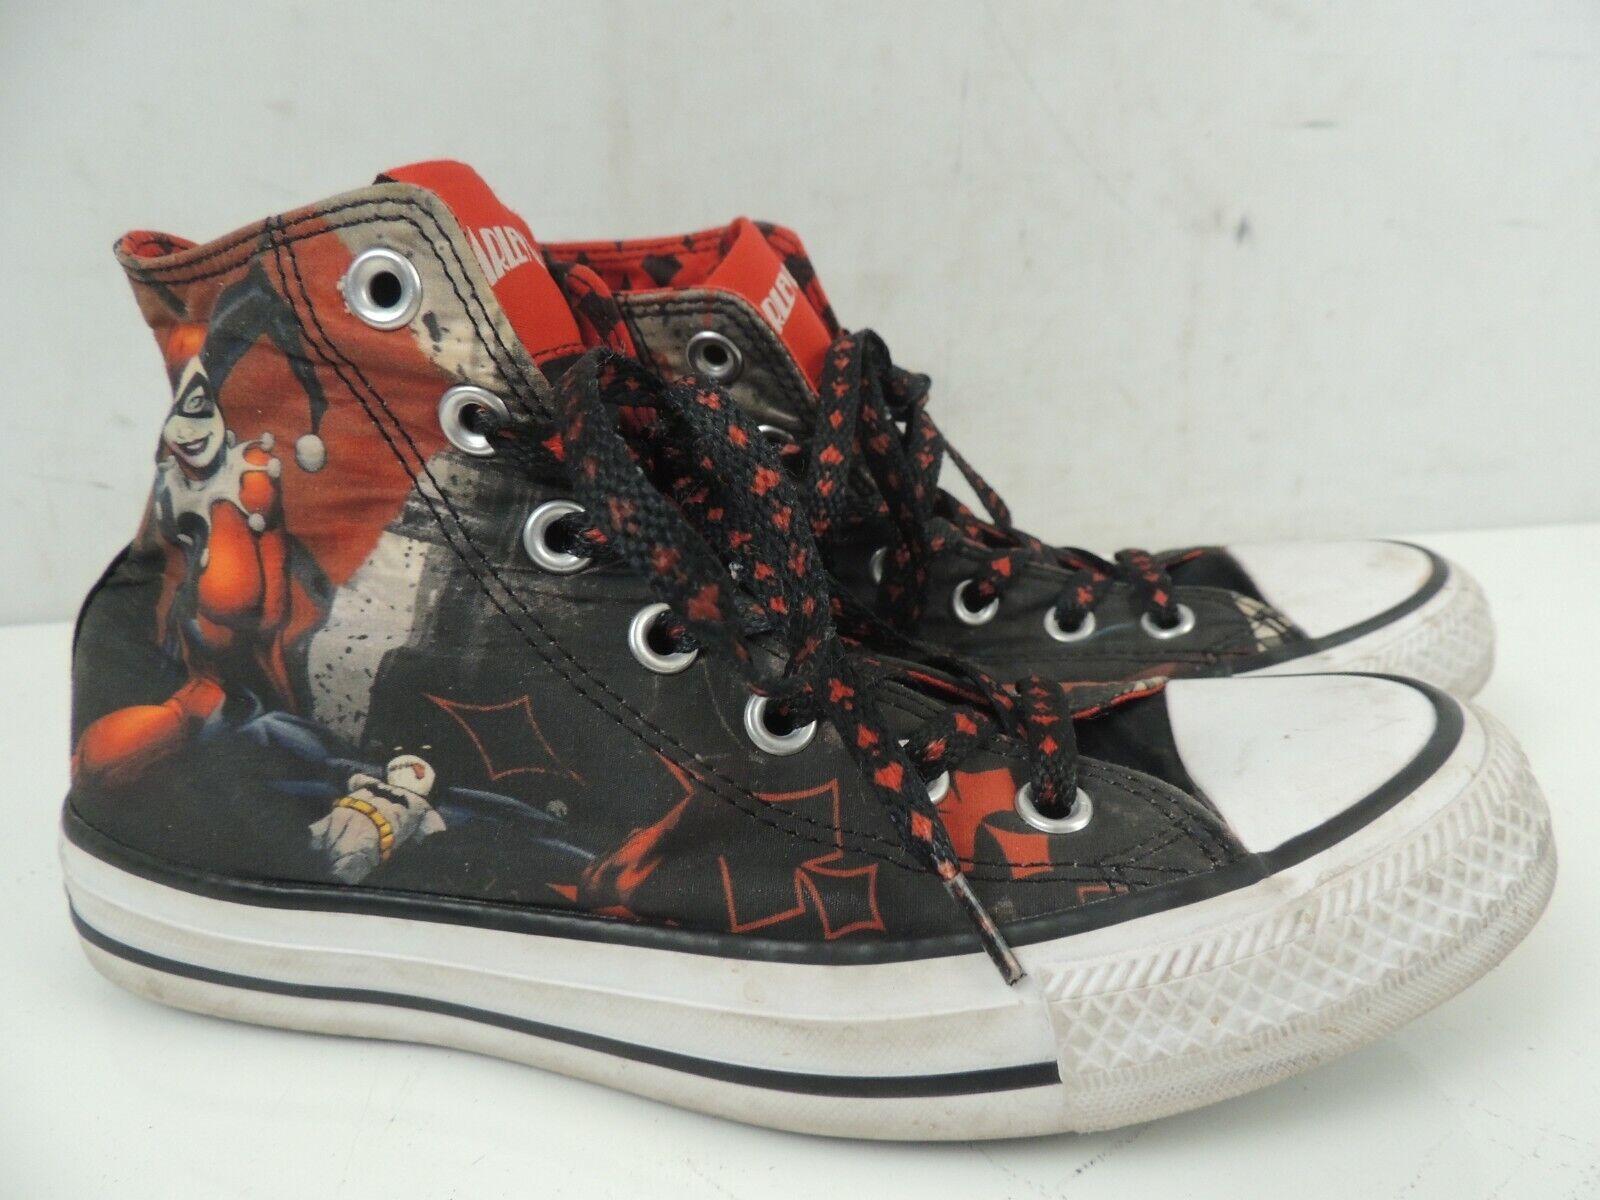 Converse Chuck Taylor All Star Harley Quinn DC Batman Shoes Women's Size 7